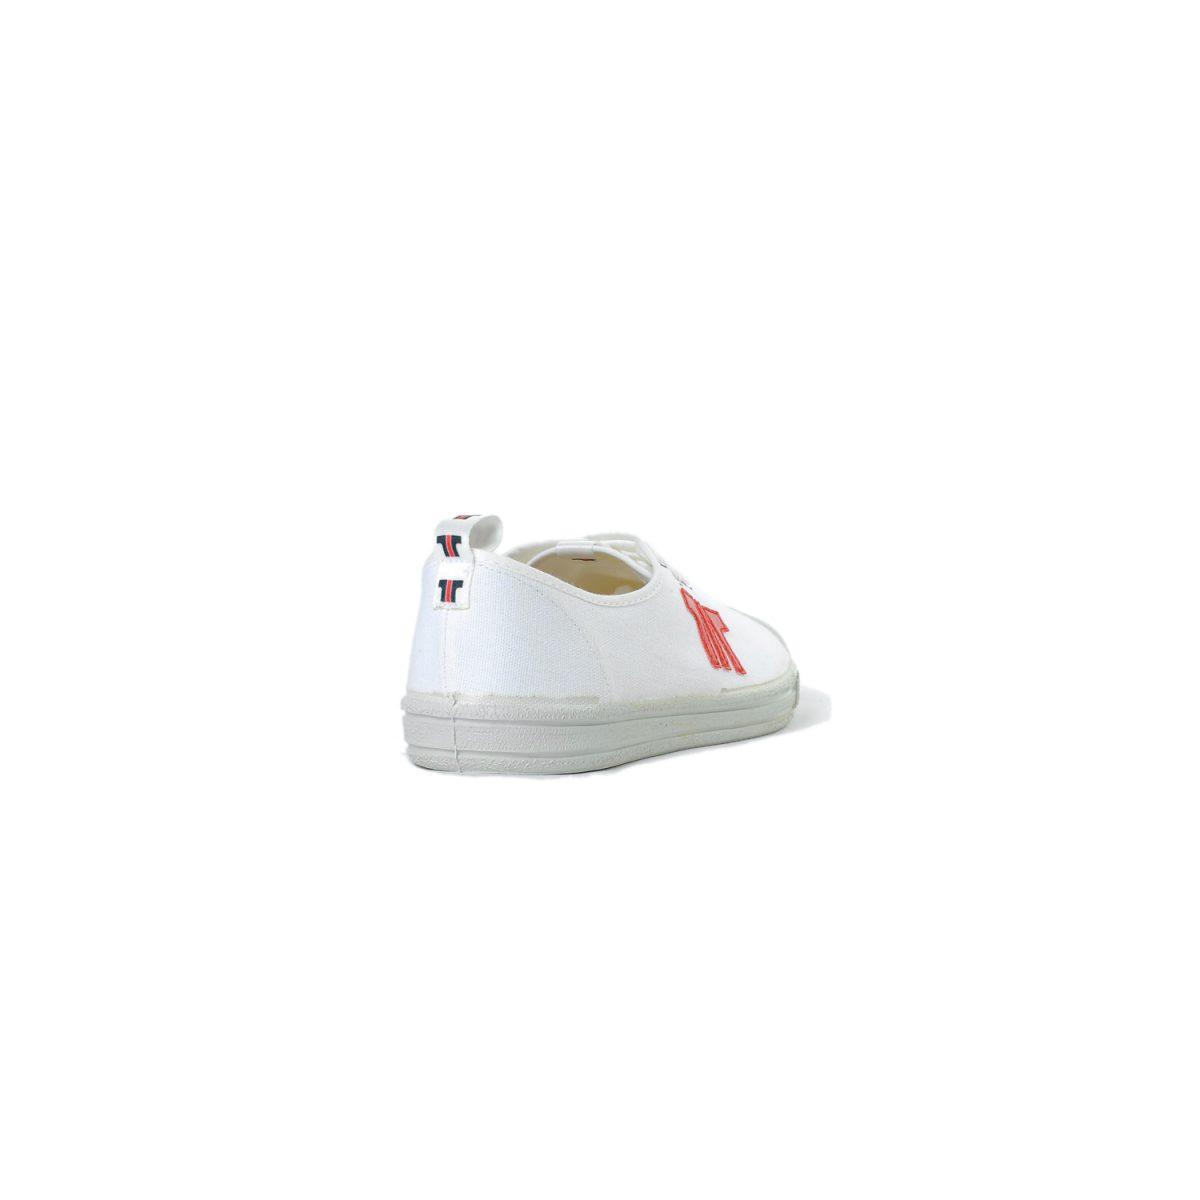 Tisza shoes - Camping - White